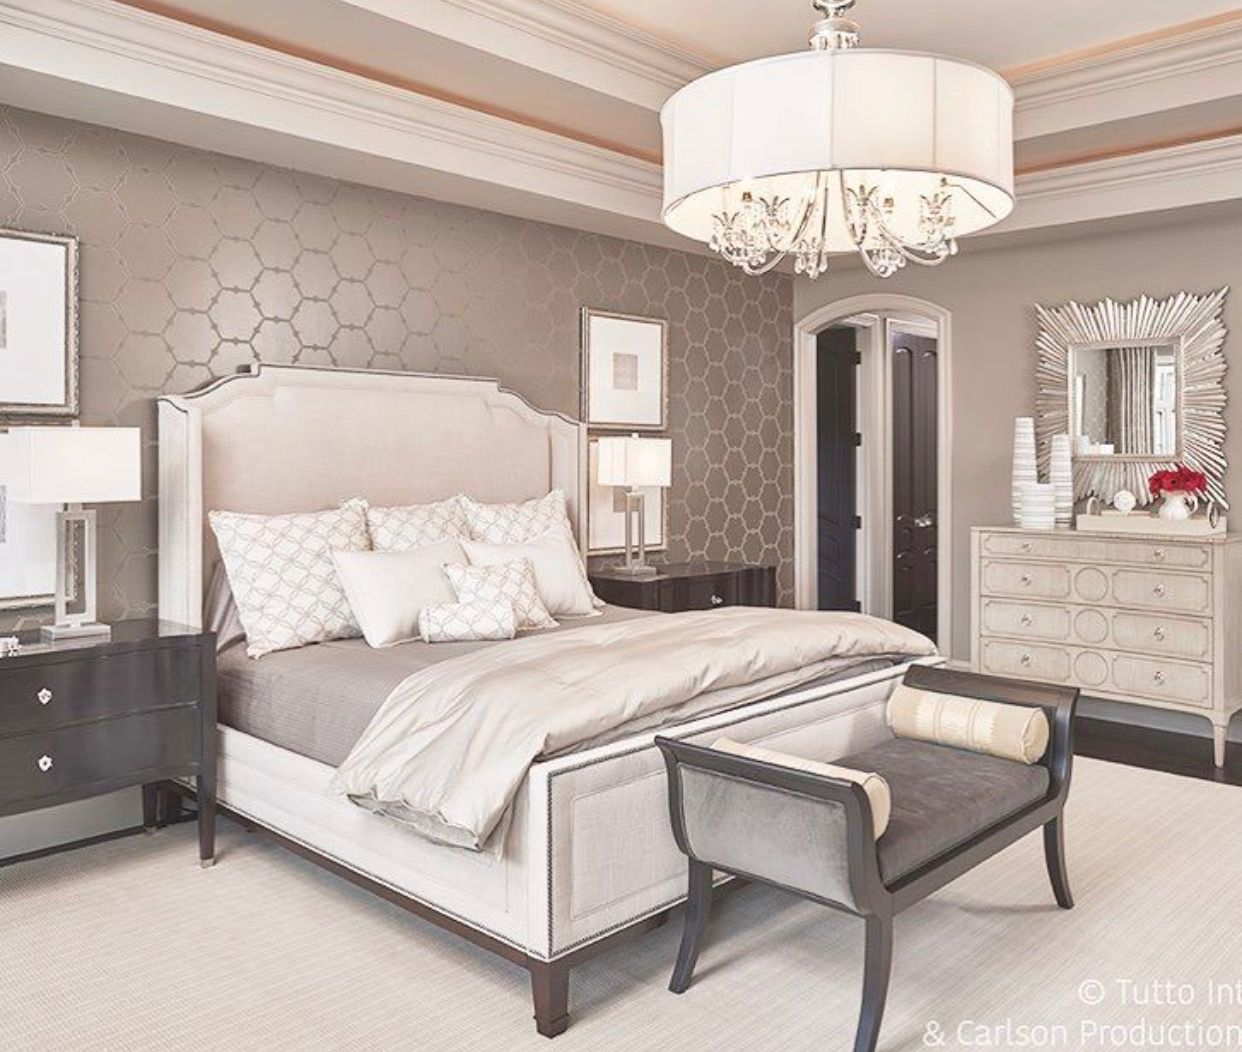 Design An Elegant Bedroom In 5 Easy Steps: Pin By Tamara Spagnola Hornbuckle On Master Bedroom